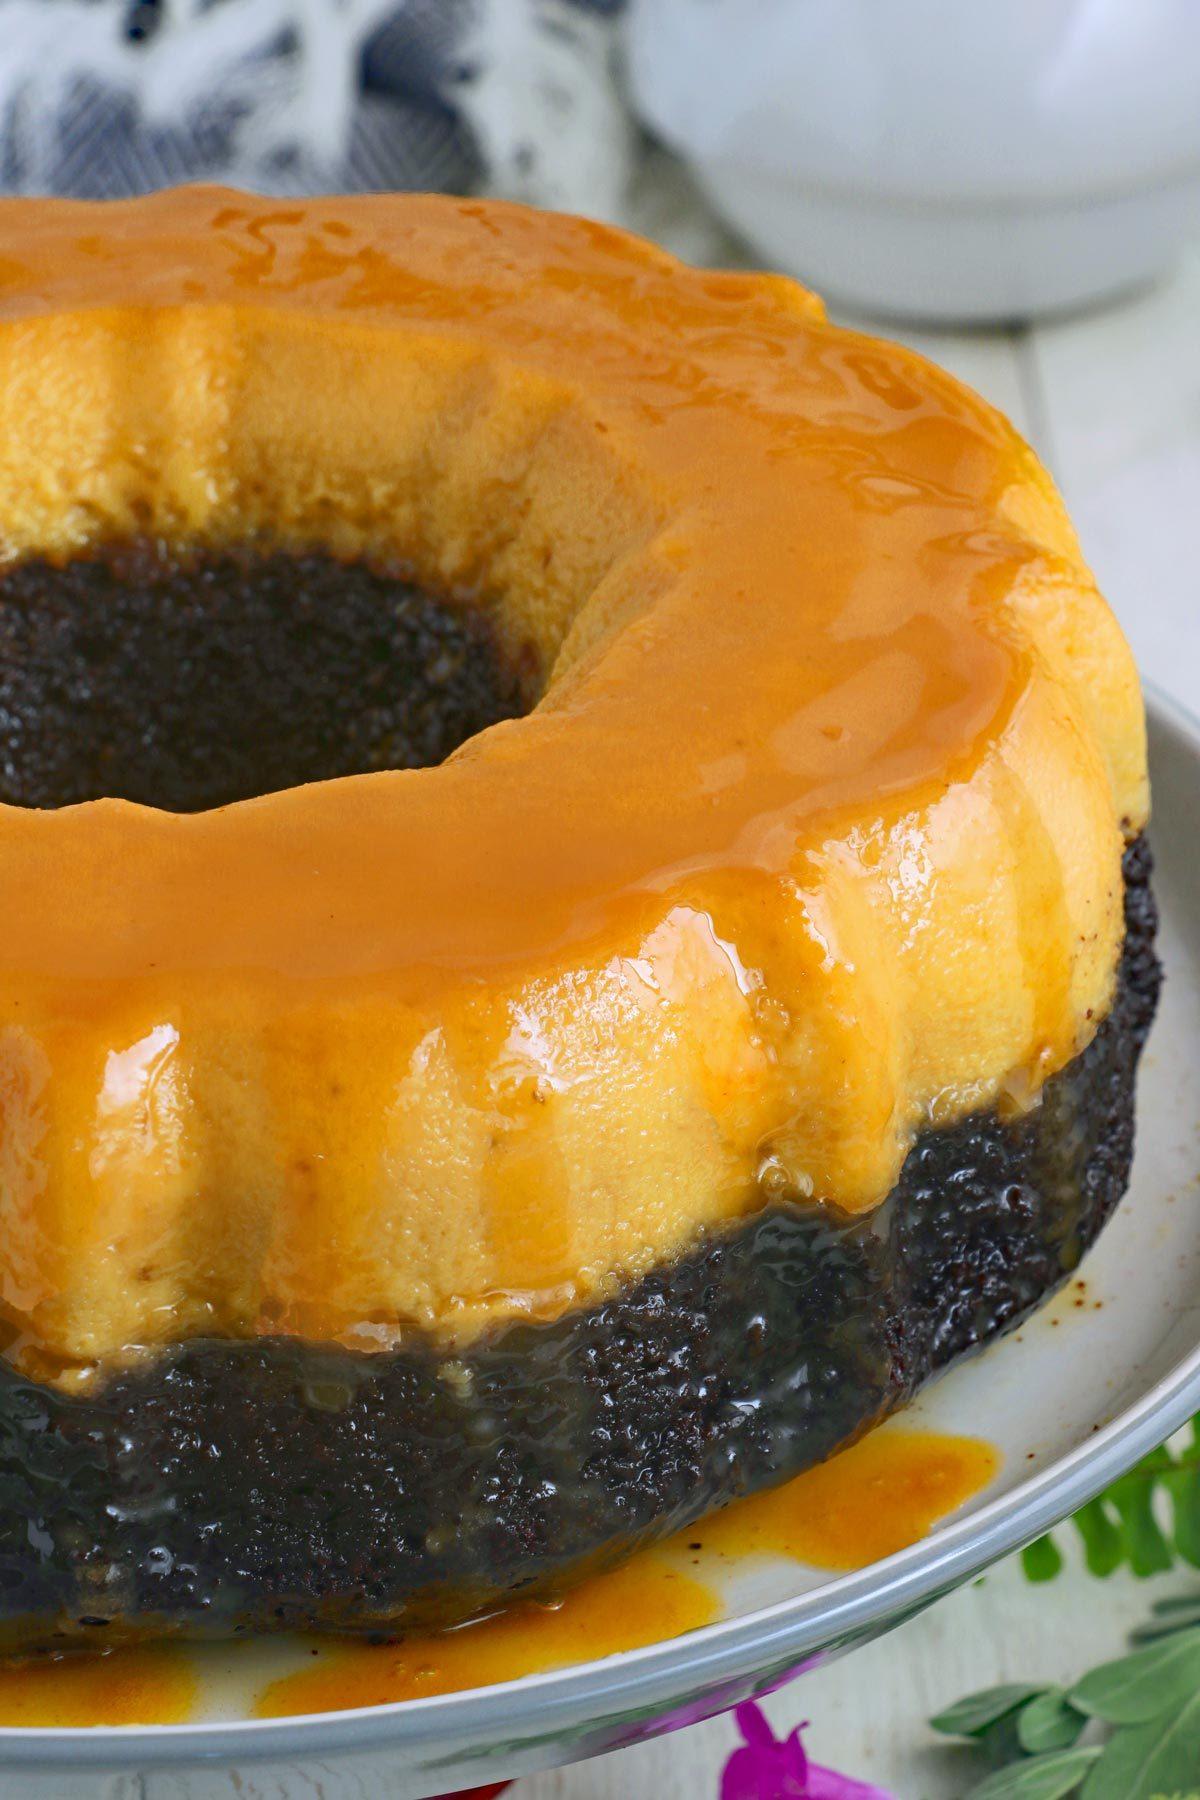 Chocoflan- a three layer dessert of chocolate cake, flan and caramel sauce.